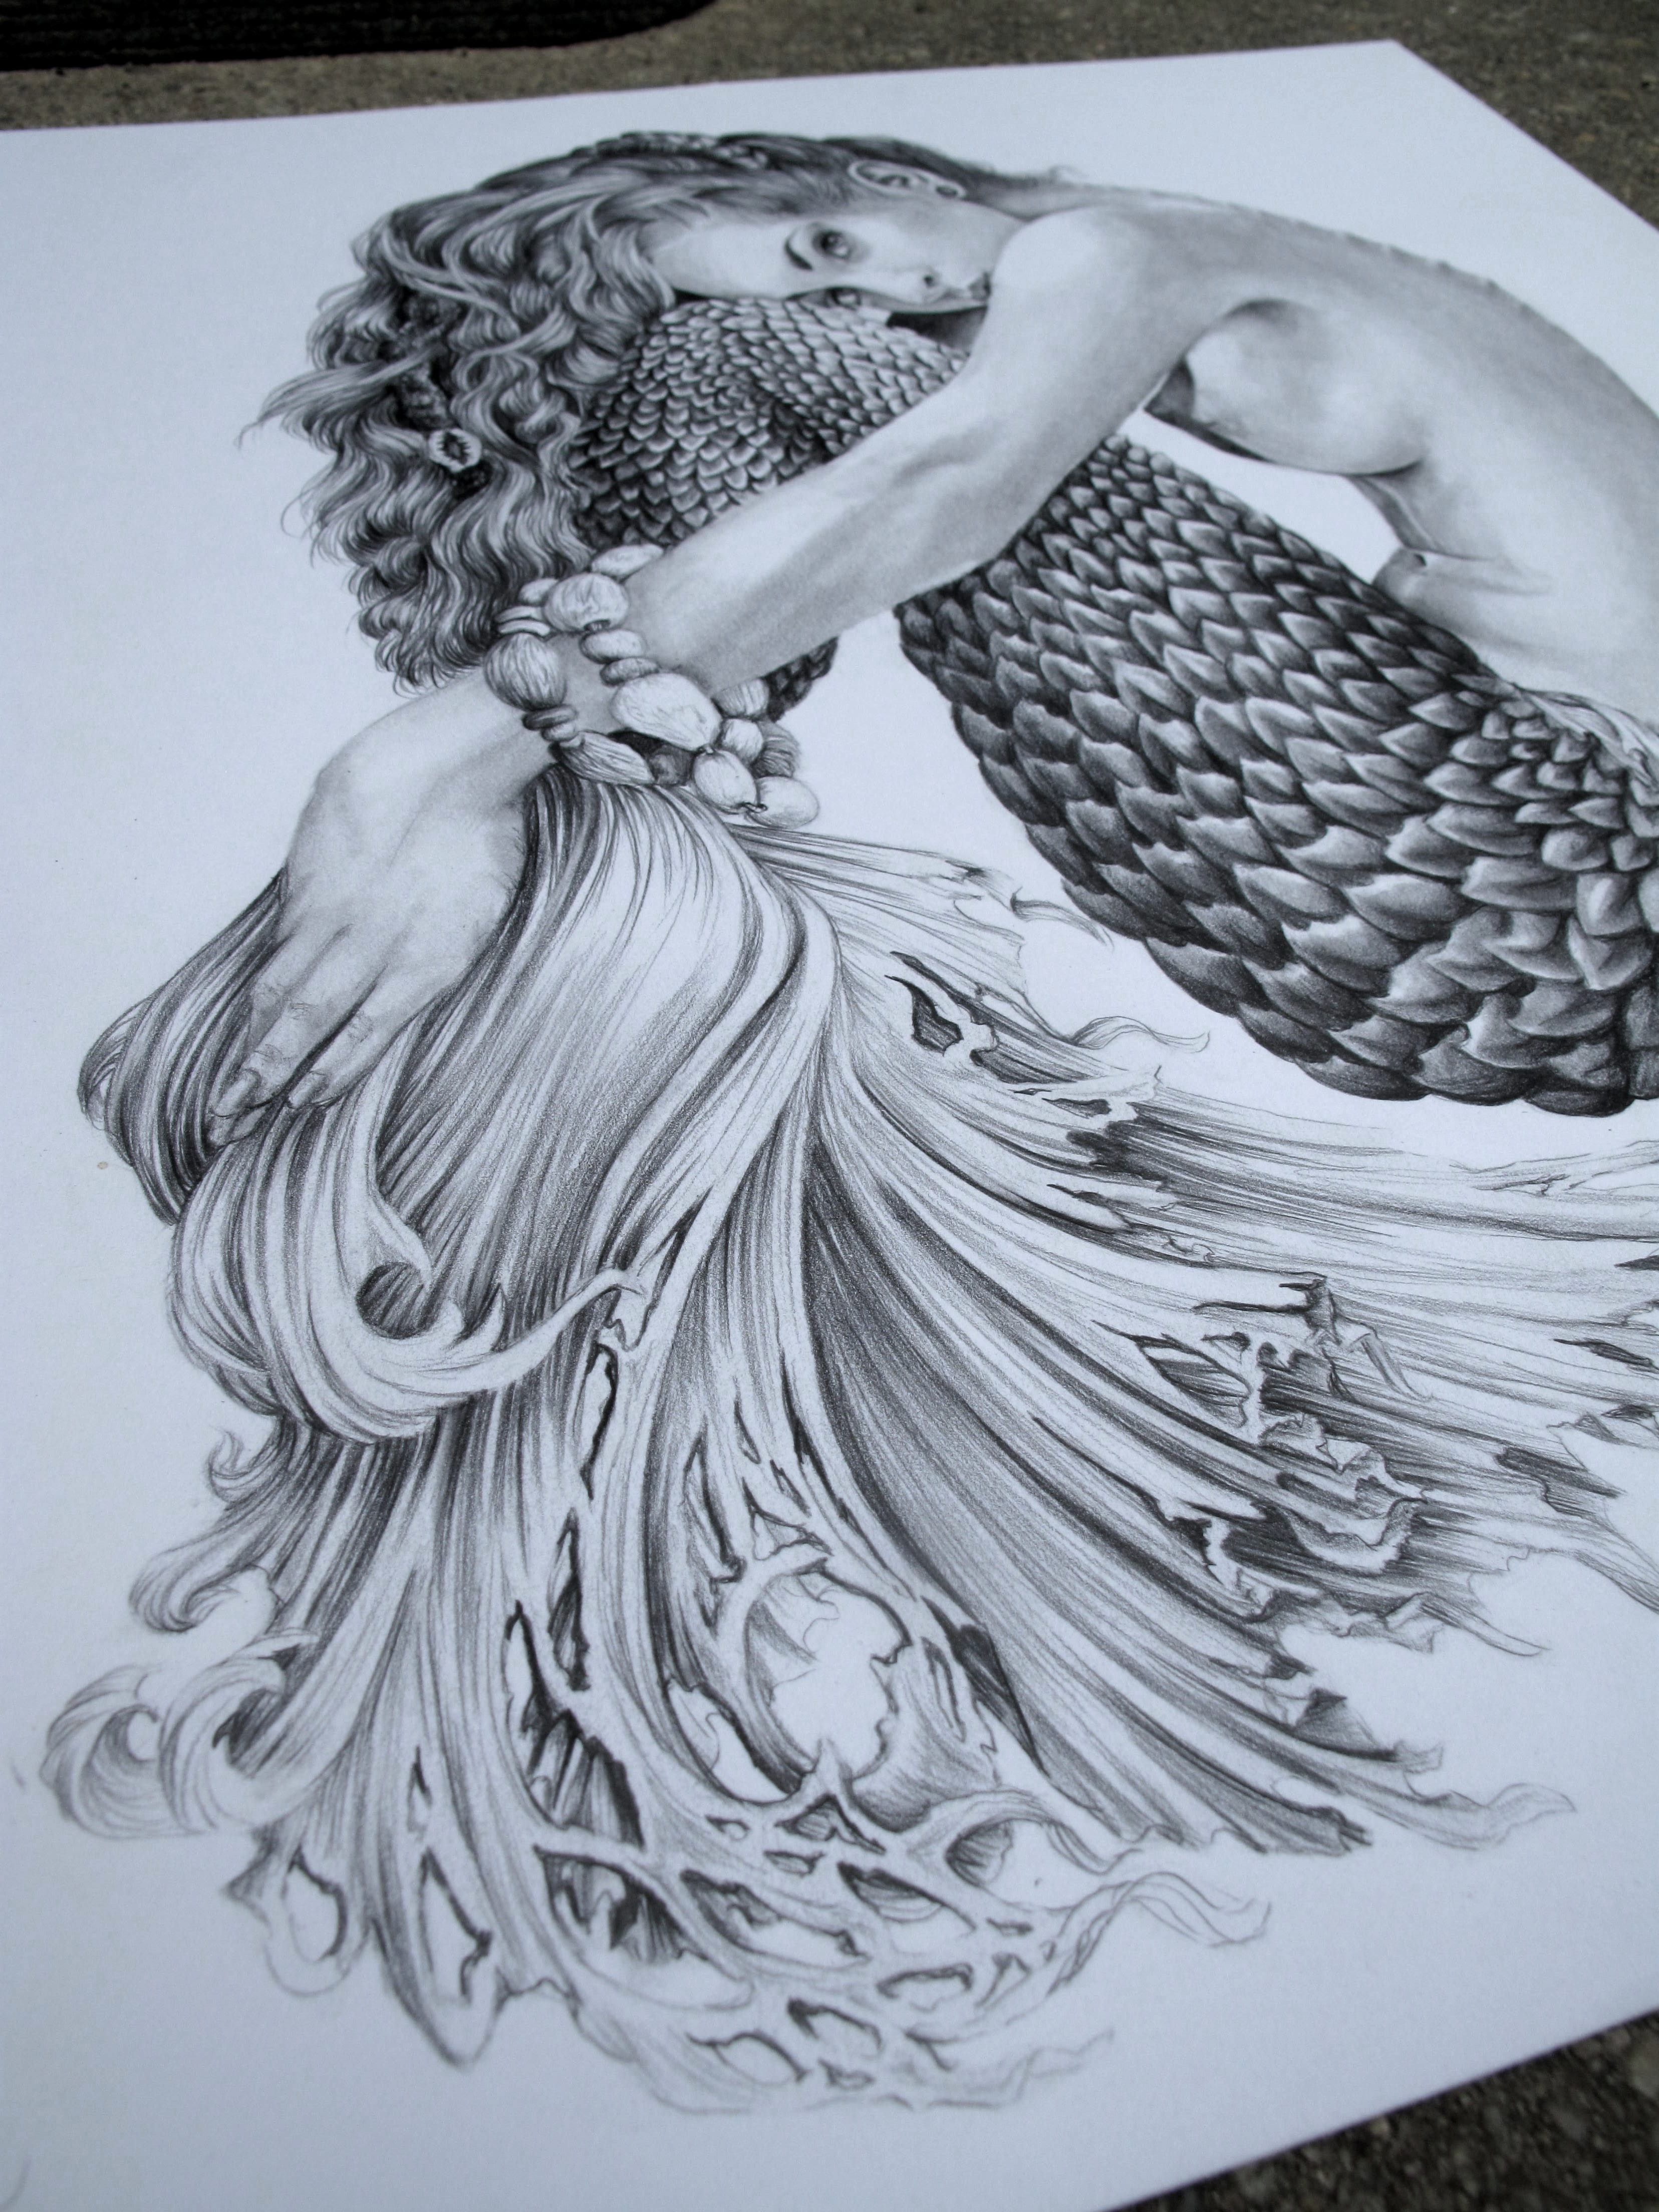 Pretty Mermaid Drawings In Pencil | www.imgkid.com - The ...